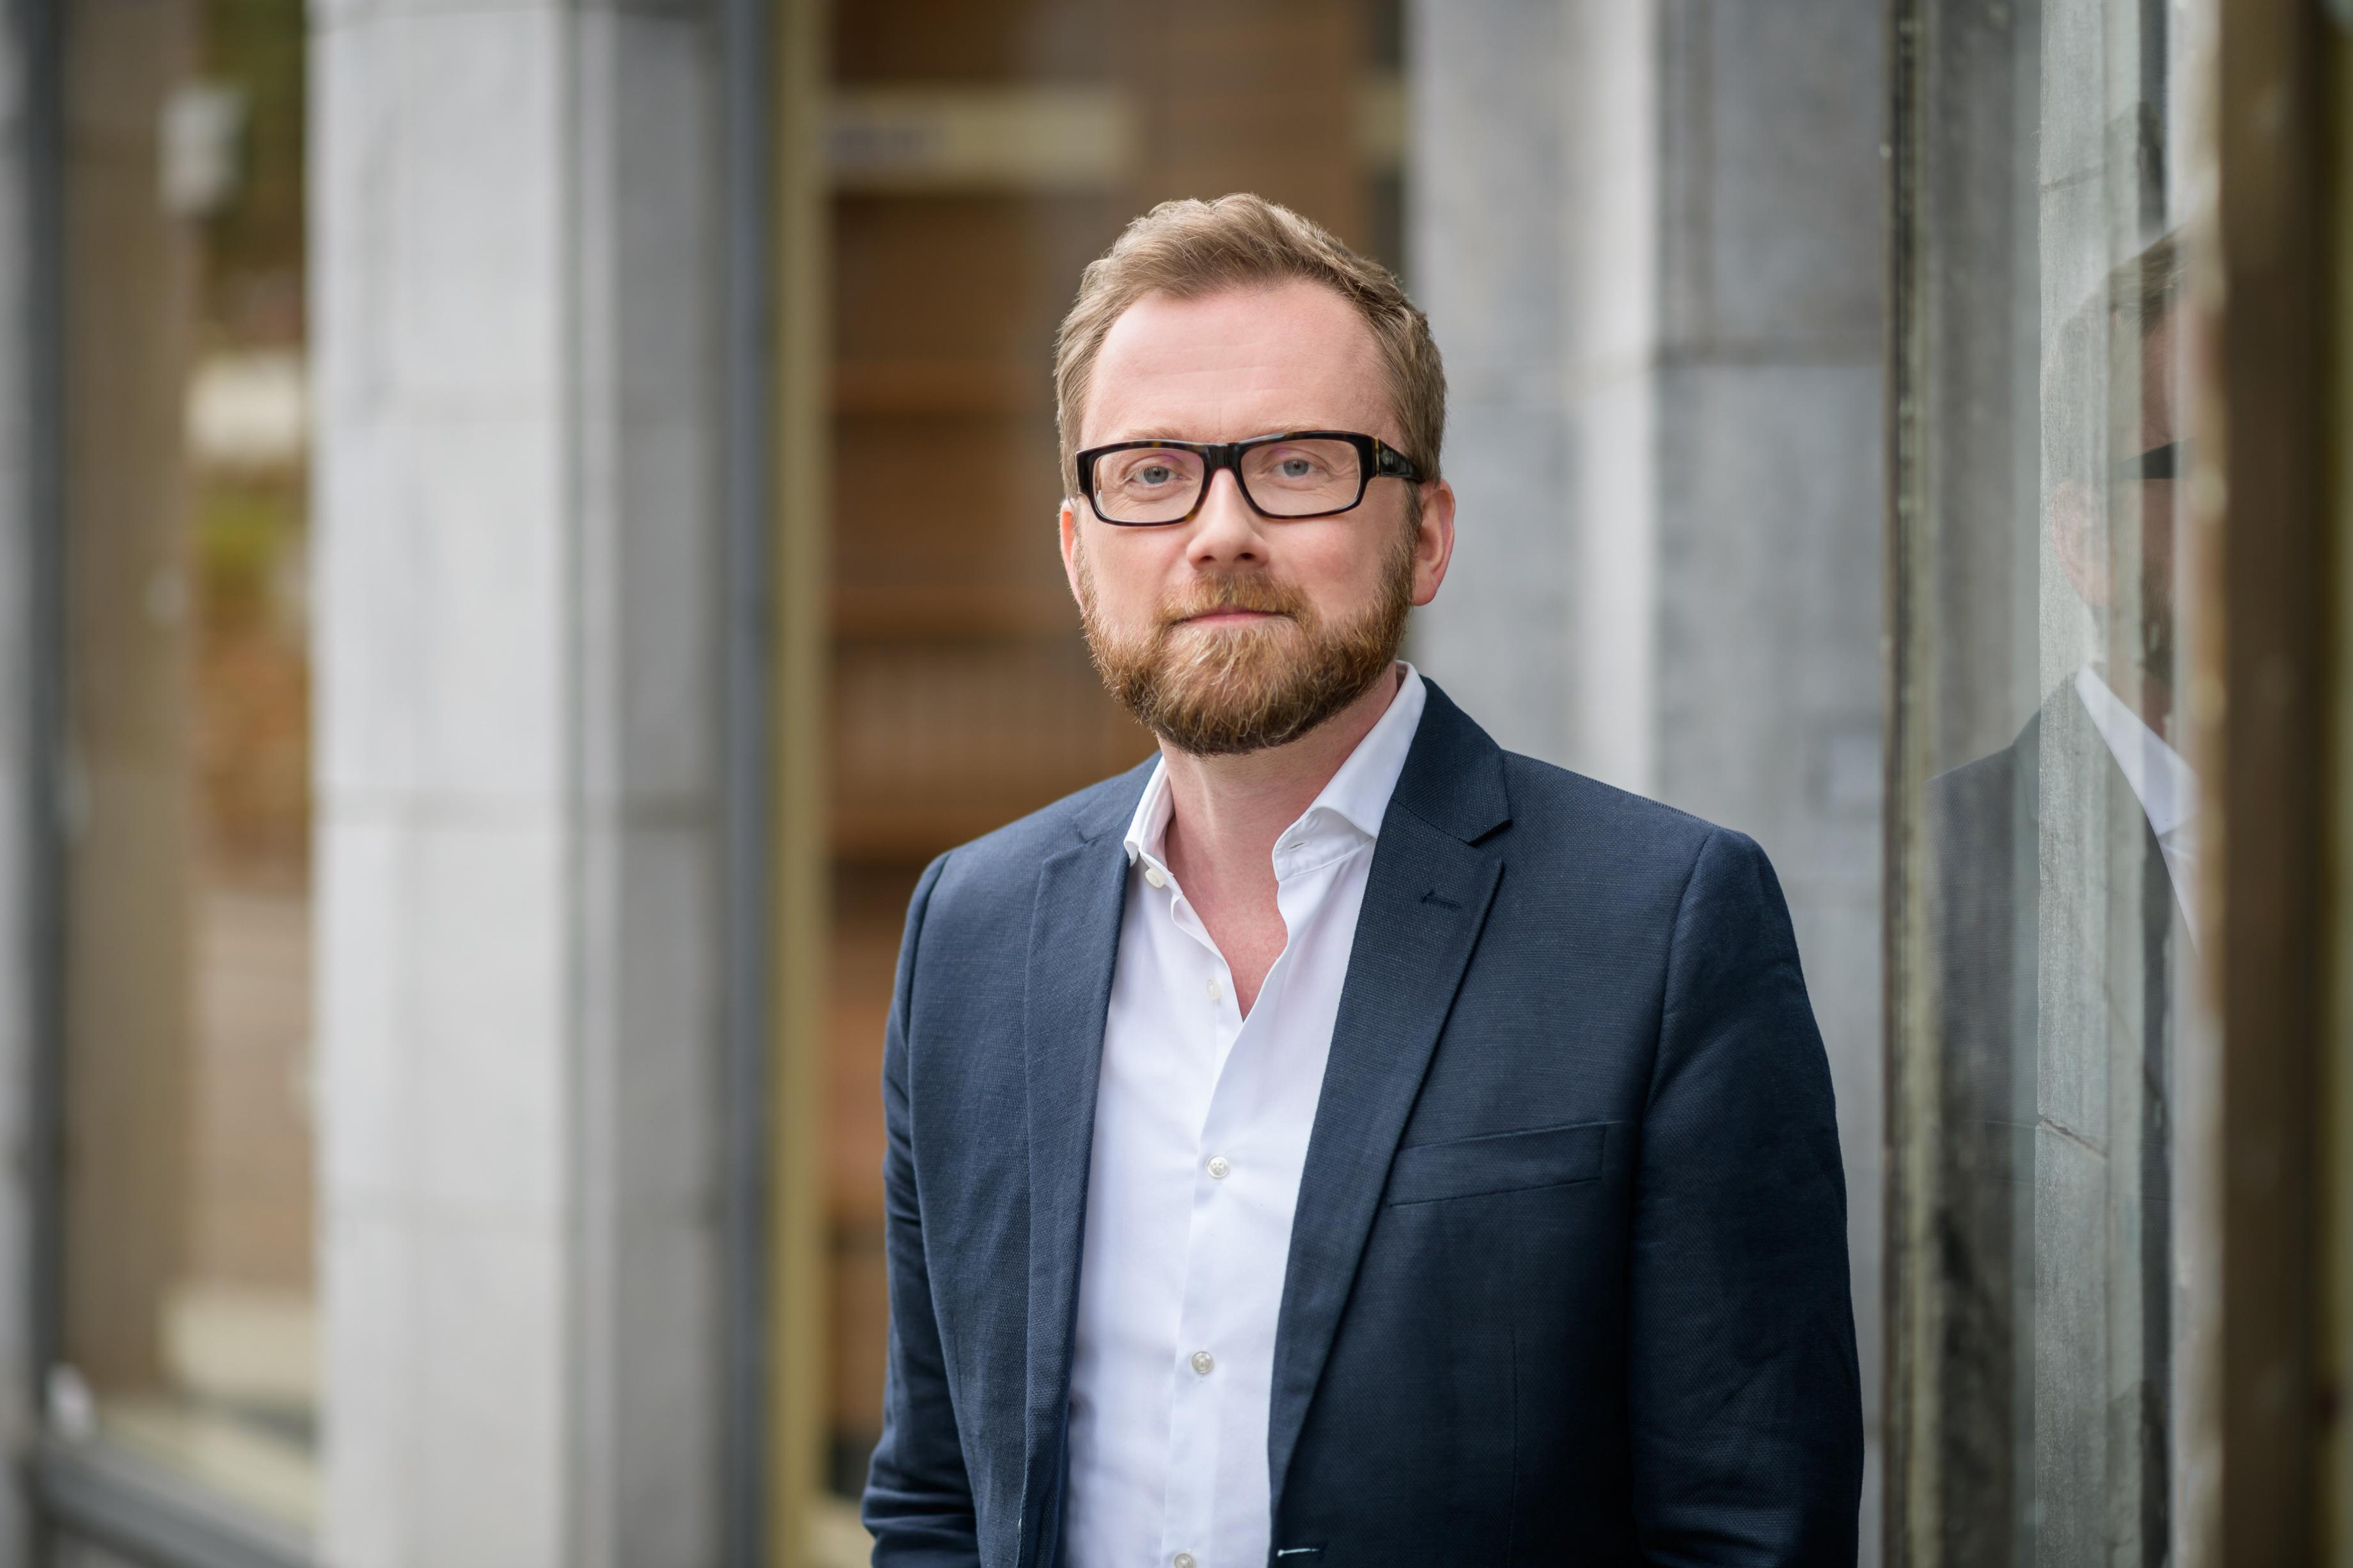 Torsten Birenheide est le directeur de Radio PSR. Il est confiant quant à l'avenir de la radio.